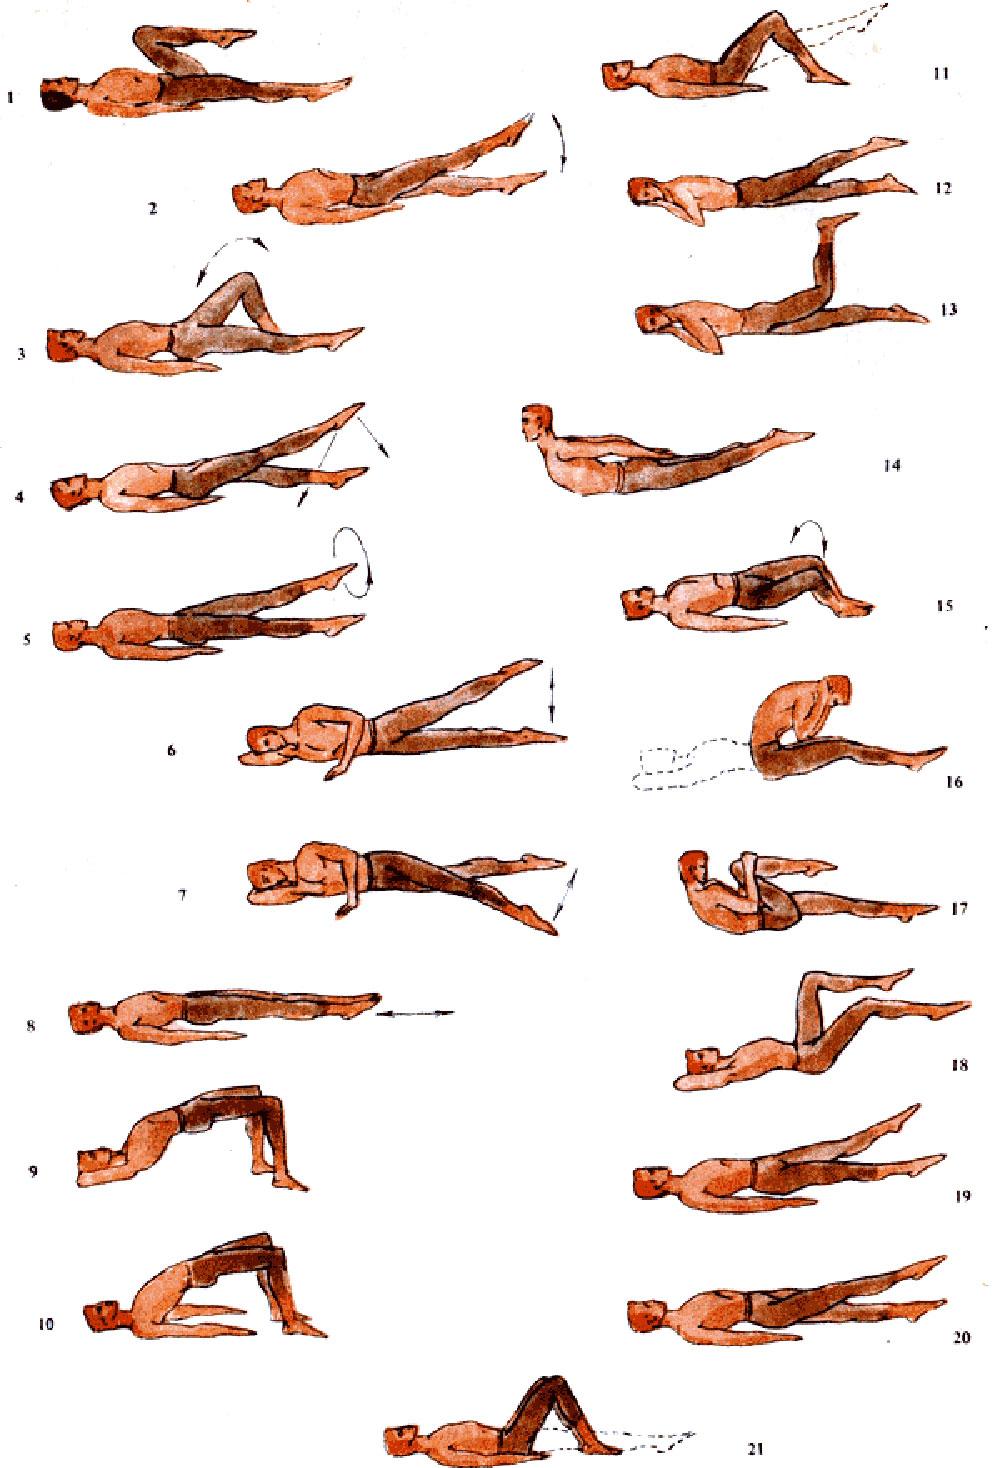 Гимнастика при остеохондрозе шейно-грудного отдела позвоночника